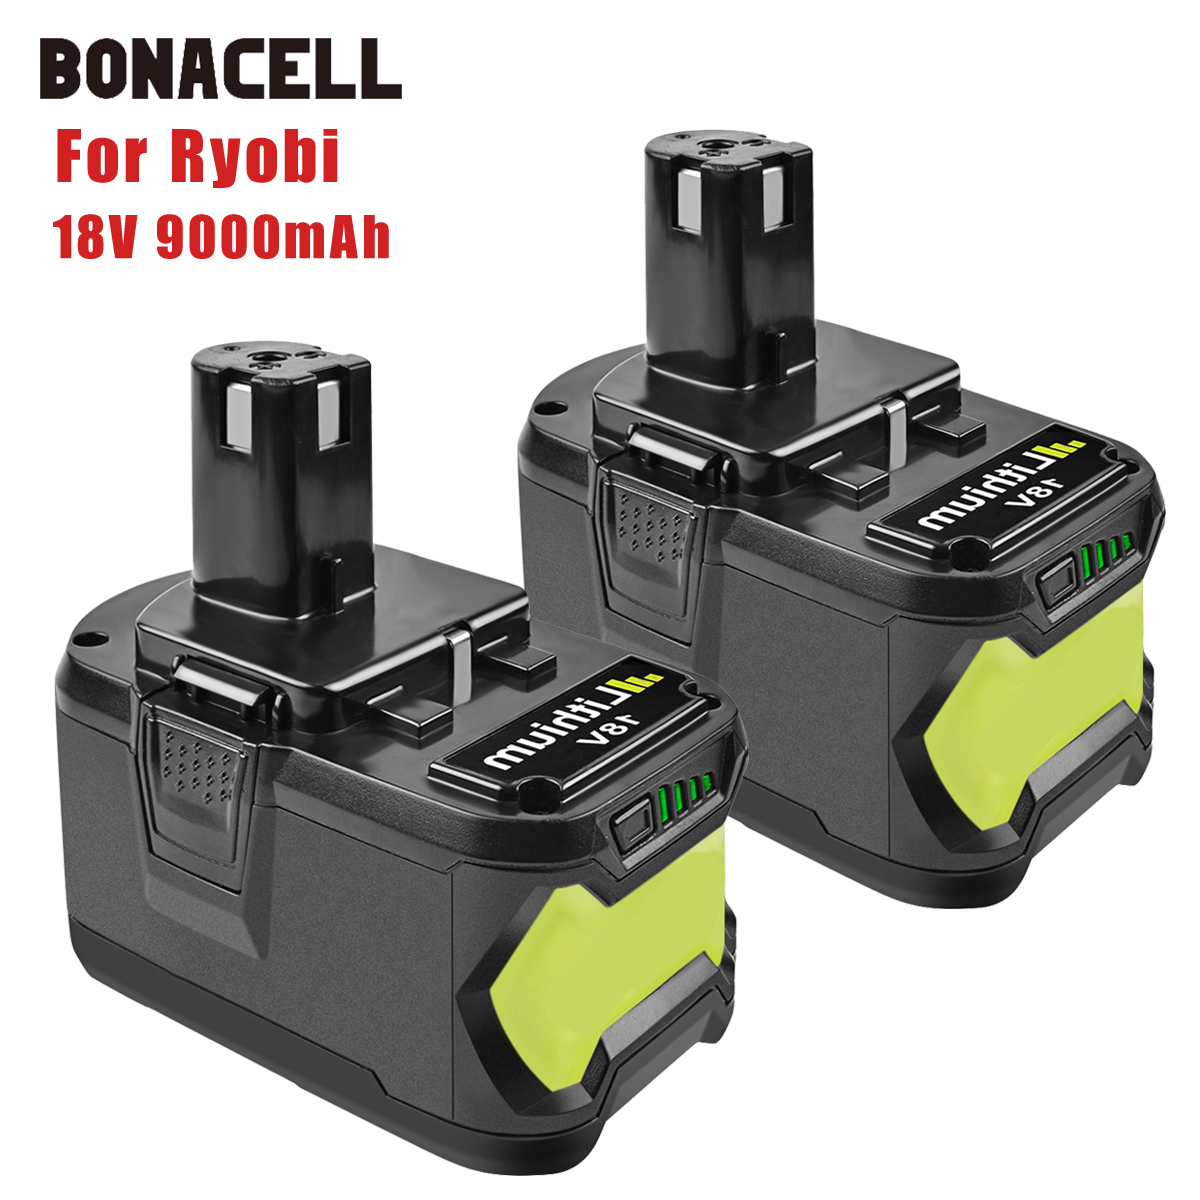 Bonacell 18V 9000mAh Li-Ion P 108 P108 Rechargeable Battery For Ryobi Battery RB18L40 P2000 P310 For BIW180 L30